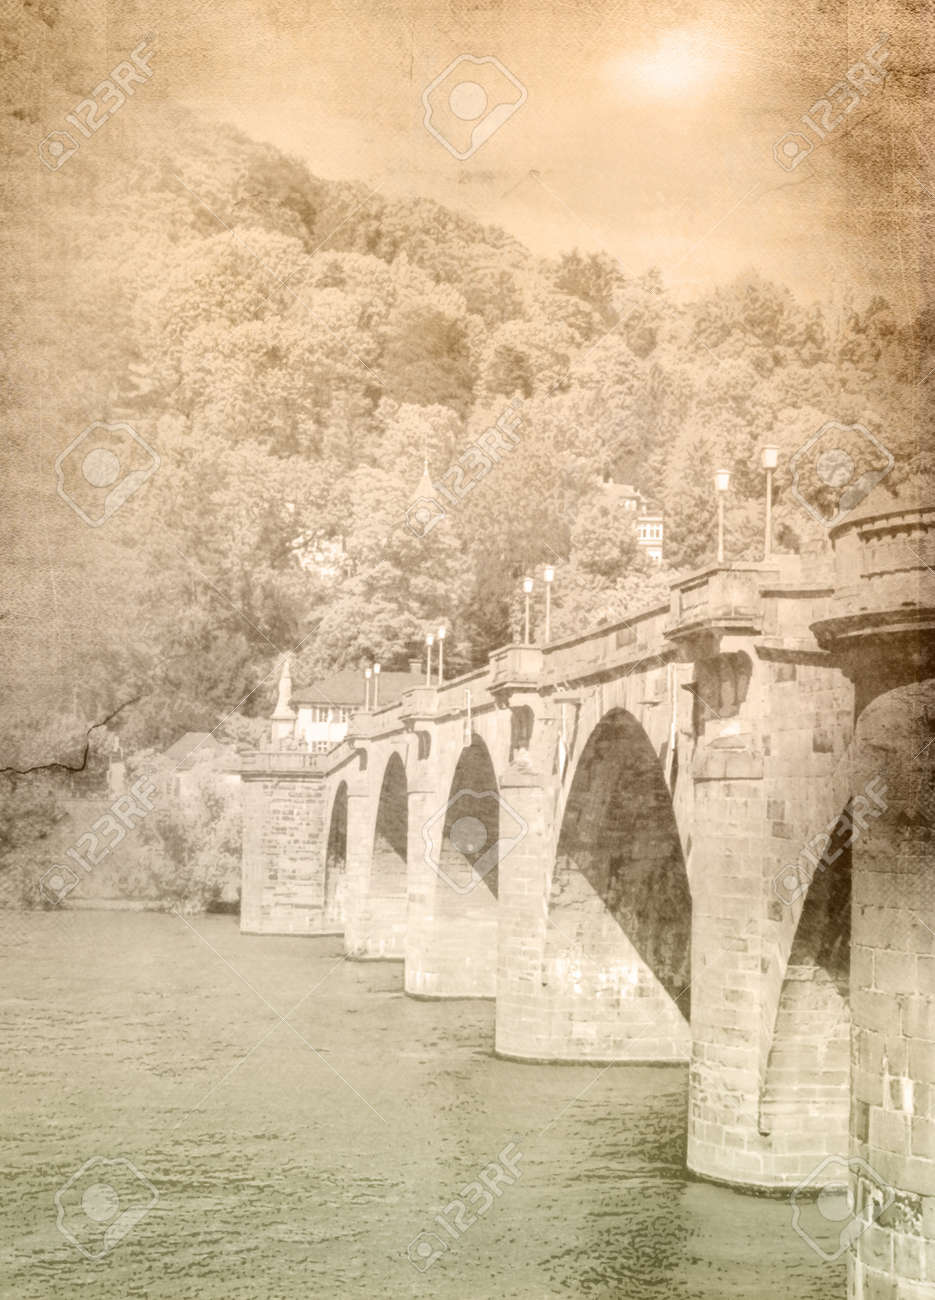 Heidelberg old bridge Karl Theodor - vintage style picture Stock Photo - 20708386